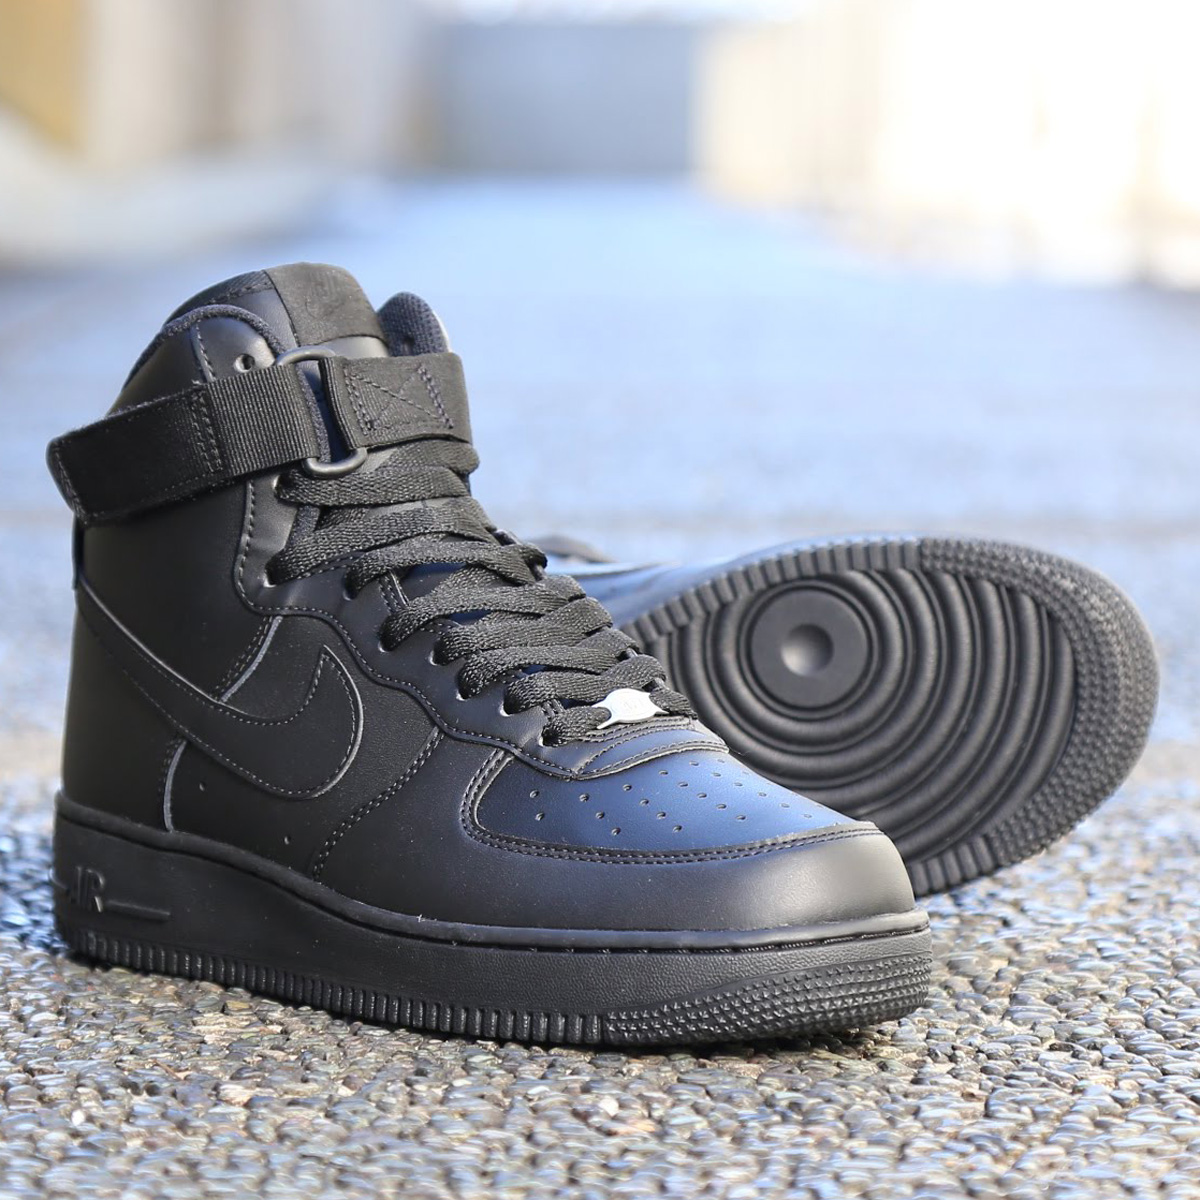 new products 479a9 b5fcb NIKE AIR FORCE 1 HIGH  07 (Nike air force 1 high 07) BLACK ...